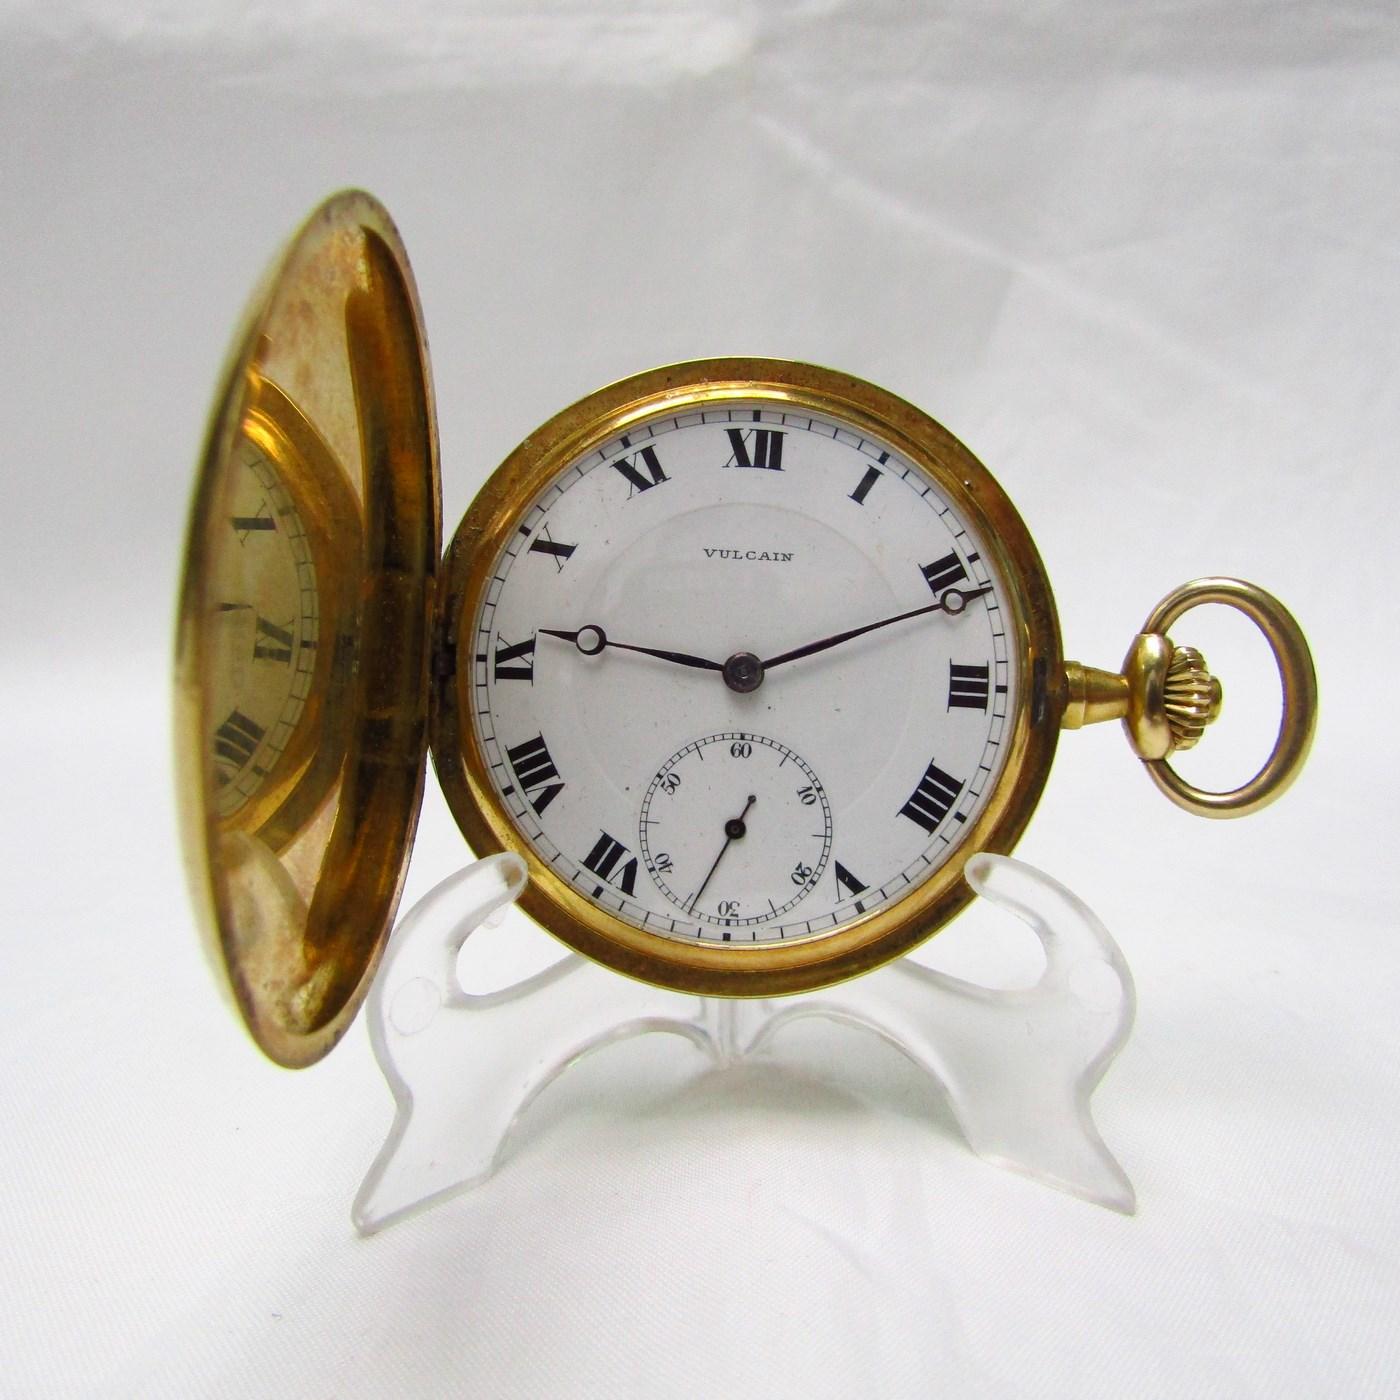 VULCAIN. Reloj de Bolsillo, saboneta y Remontoir. Suiza, ca. 1890.